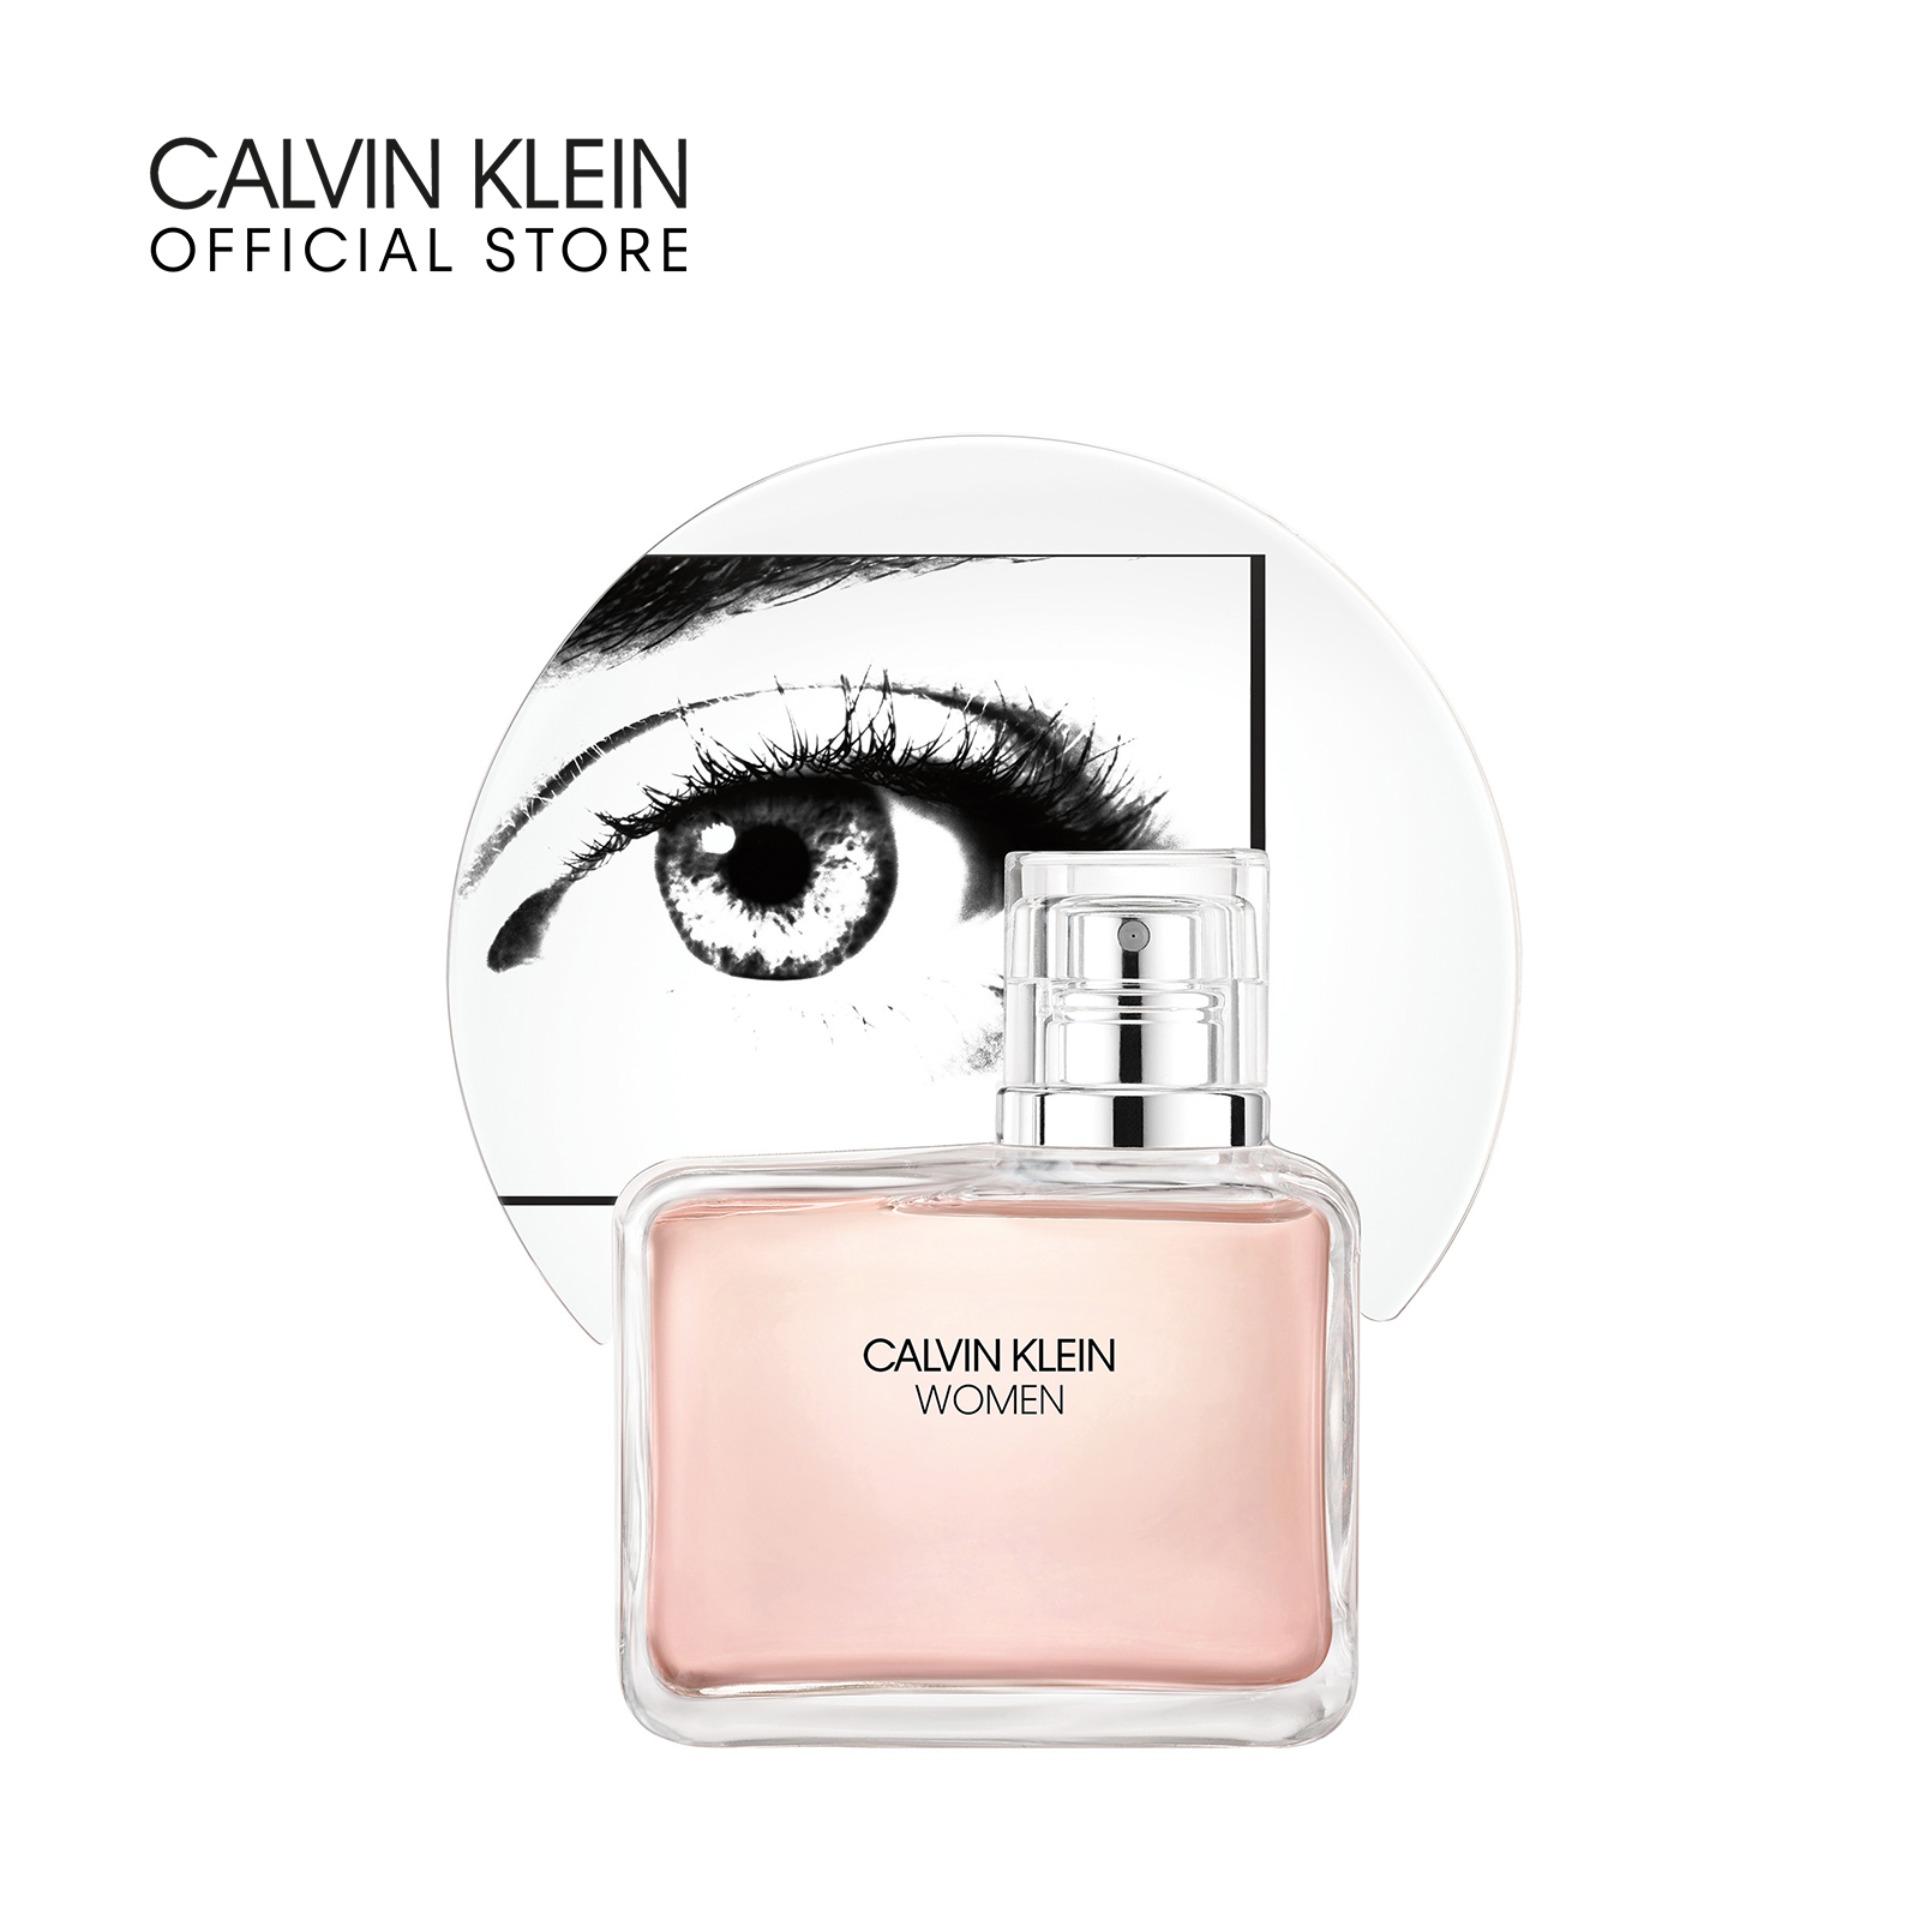 Buy CALVIN KLEIN WOMEN Eau de Parfum for Women 100ml Singapore